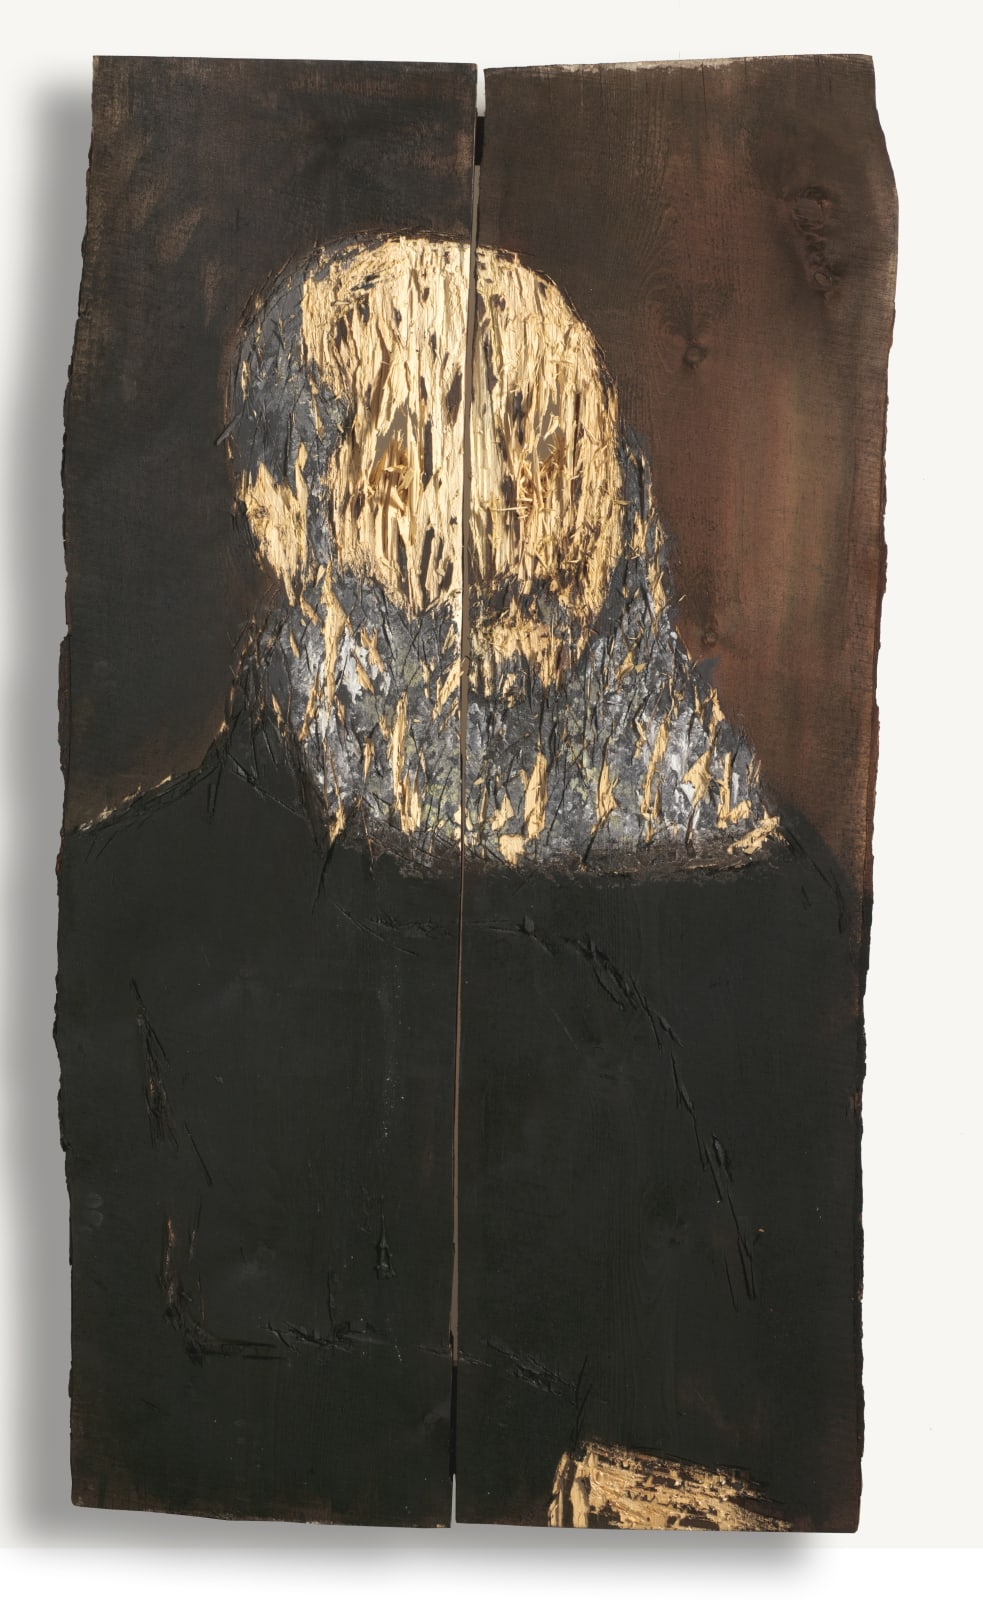 Nestor Engelke Wooden portrait of Afanasy Fet from the series